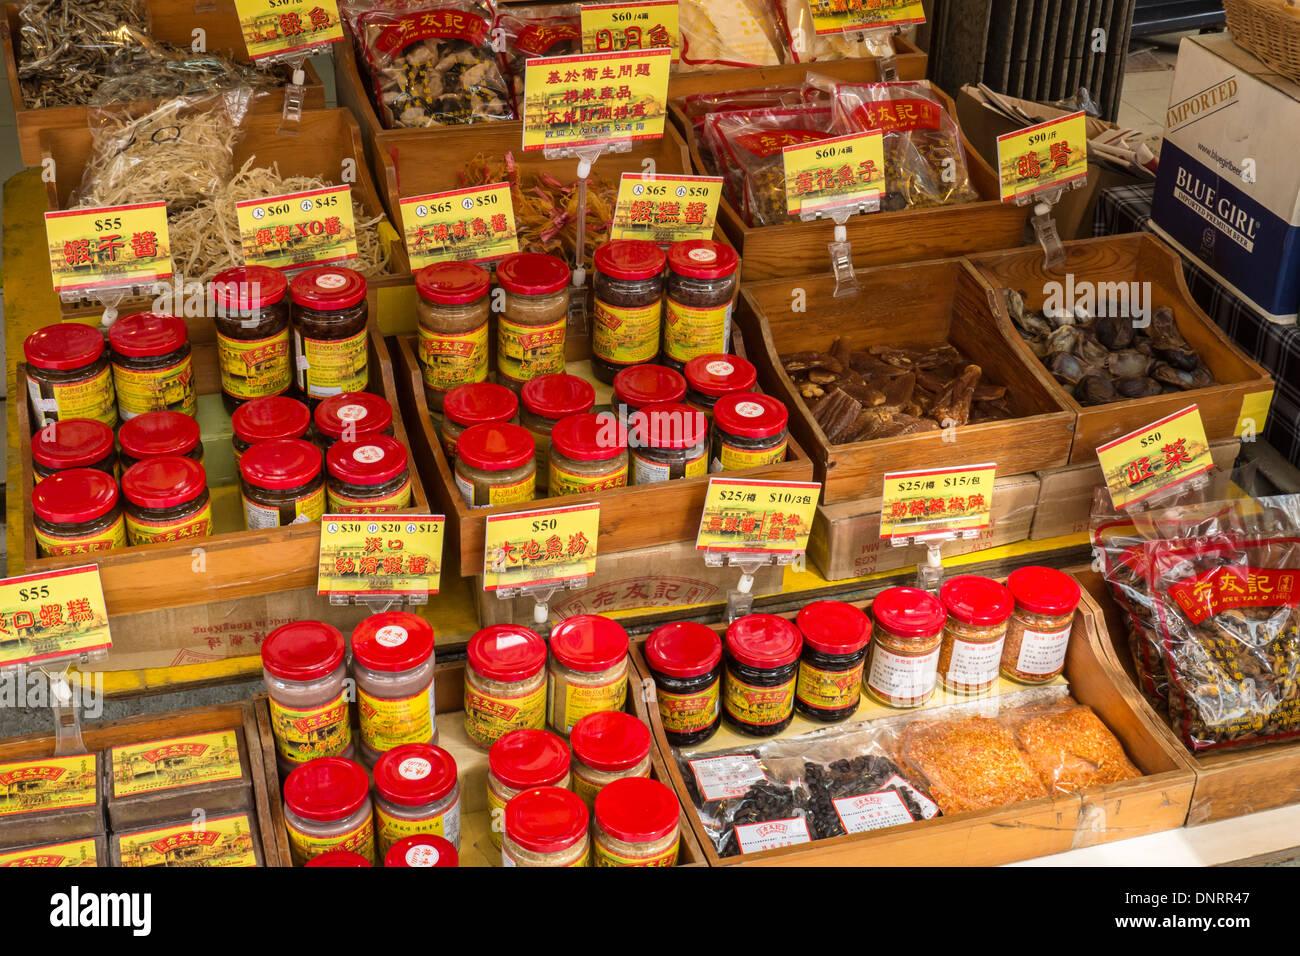 Display of Seafood Sauce, Lantau Island, Hong Kong, China - Stock Image